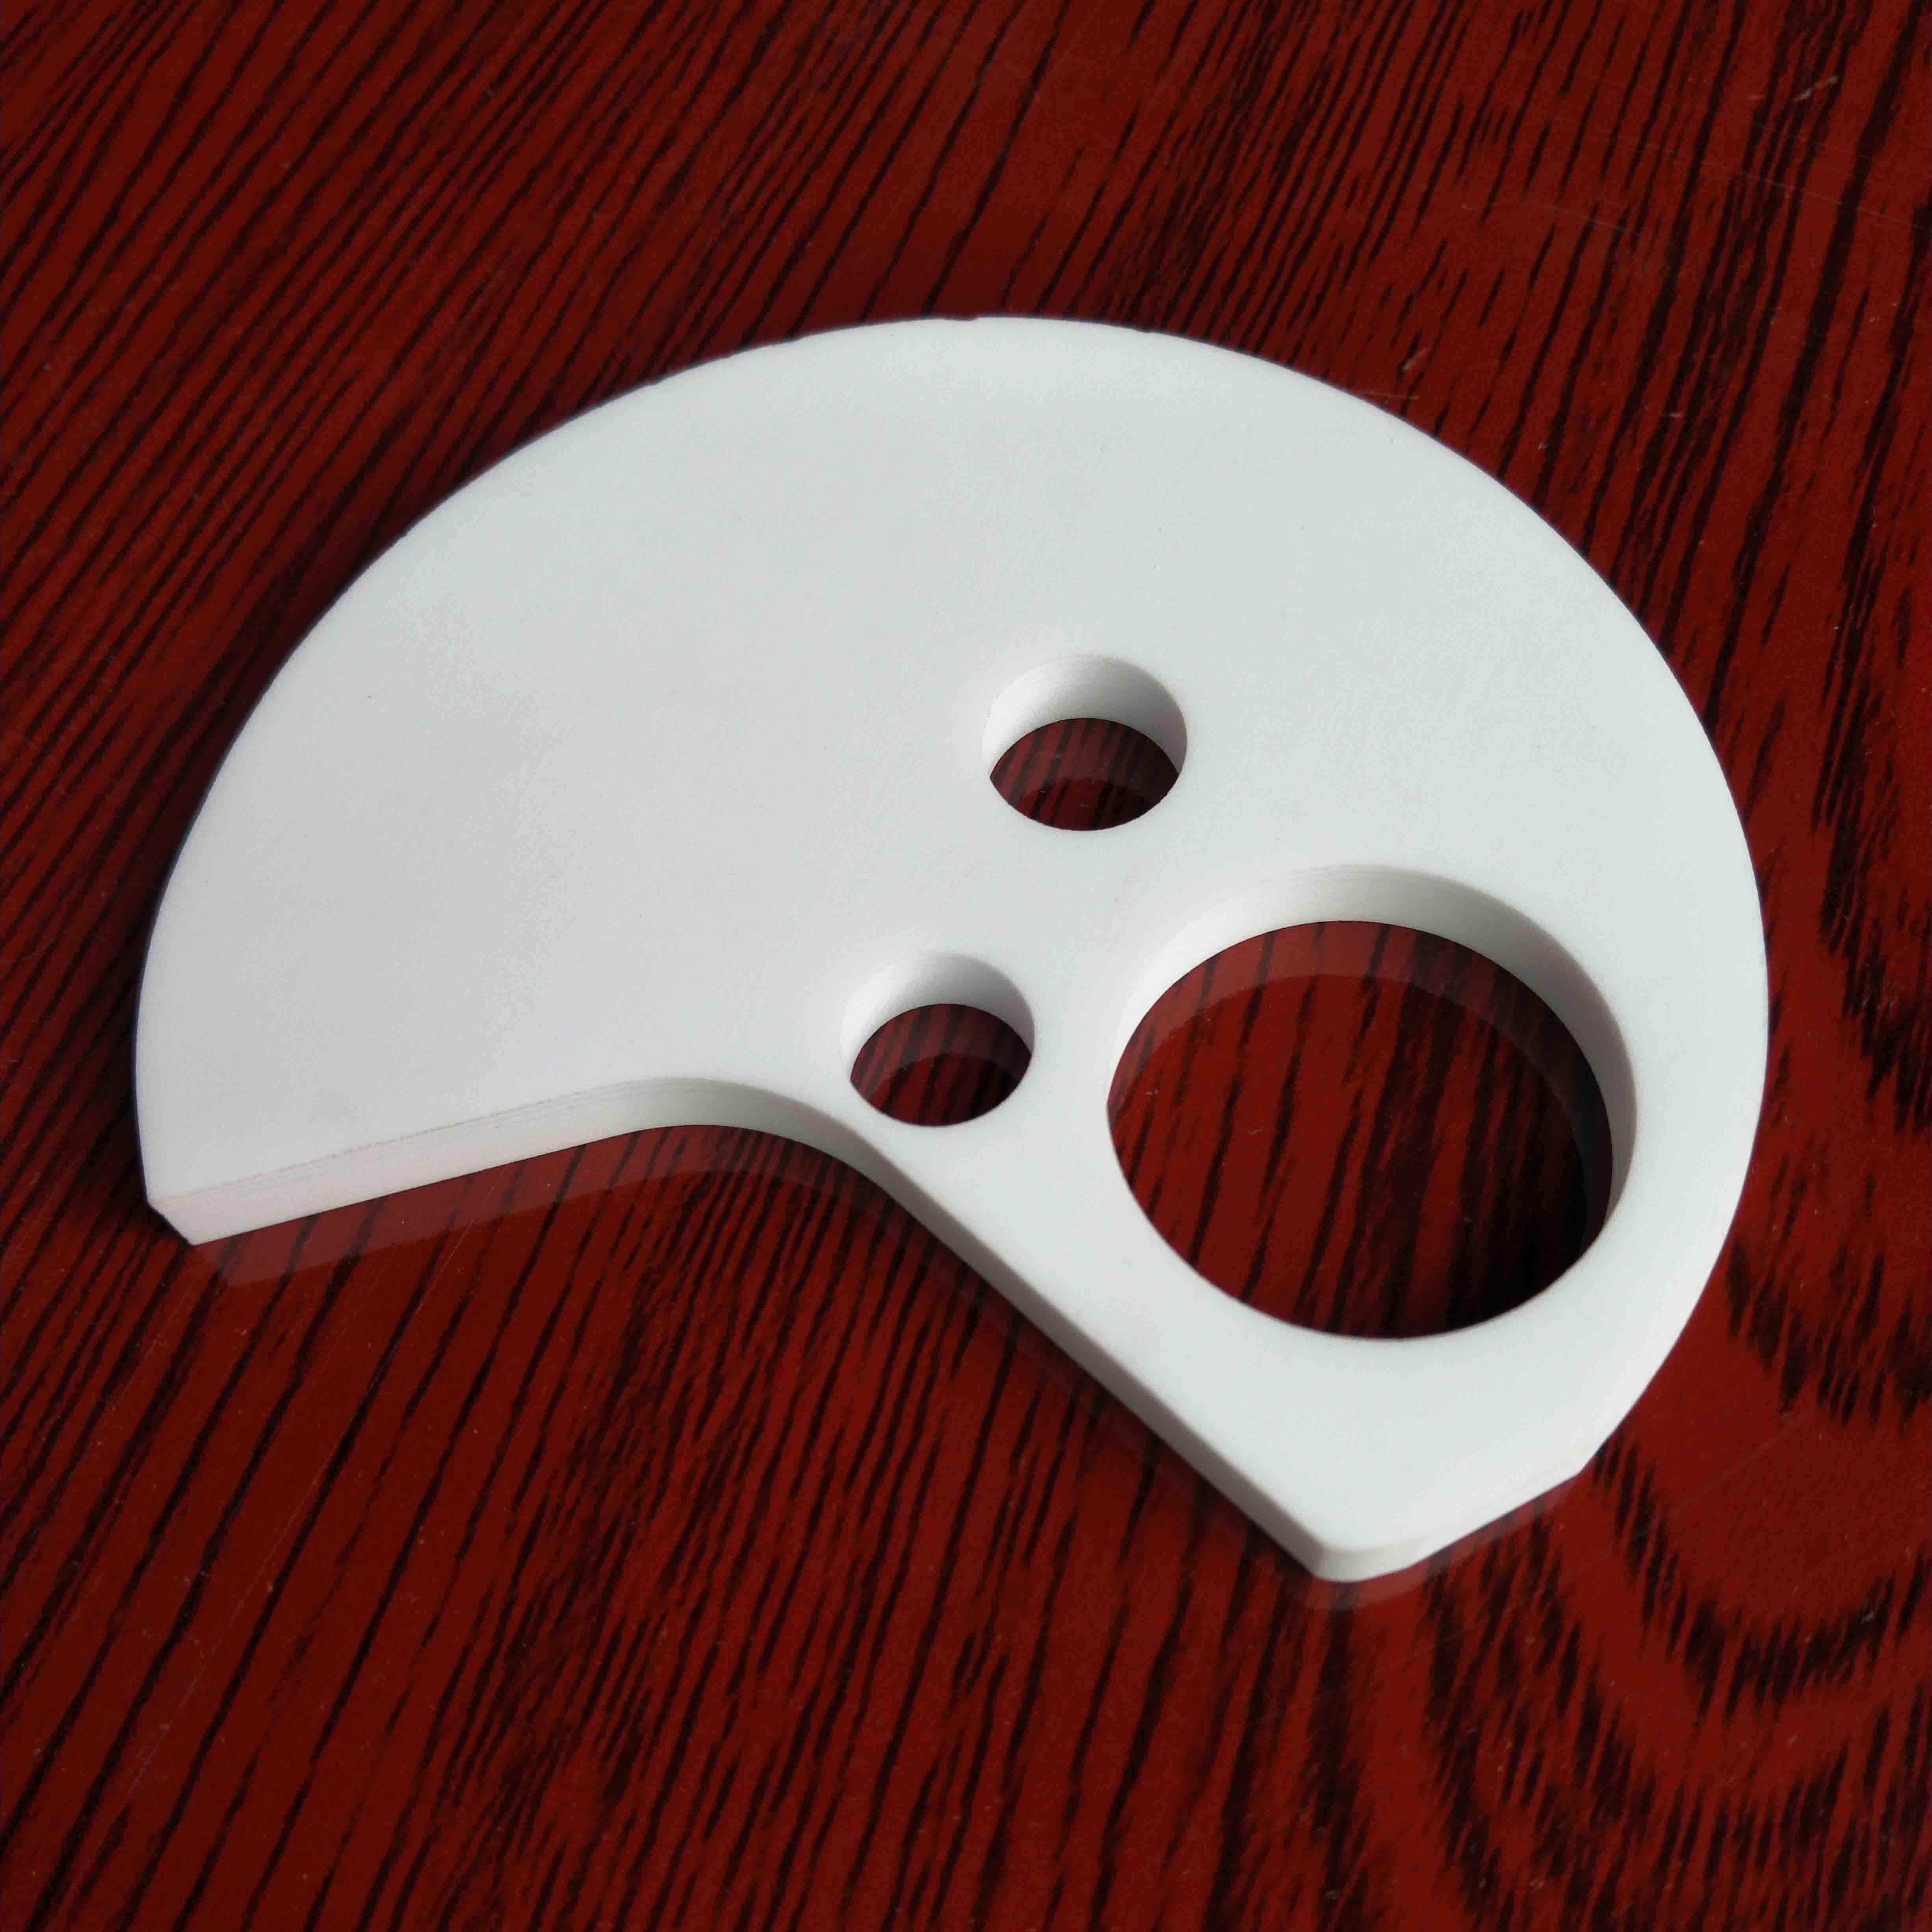 Industrial Electrical Alumina Ceramic Parts by SGJ-International (Shaanxi Sgj International Co., Ltd.)